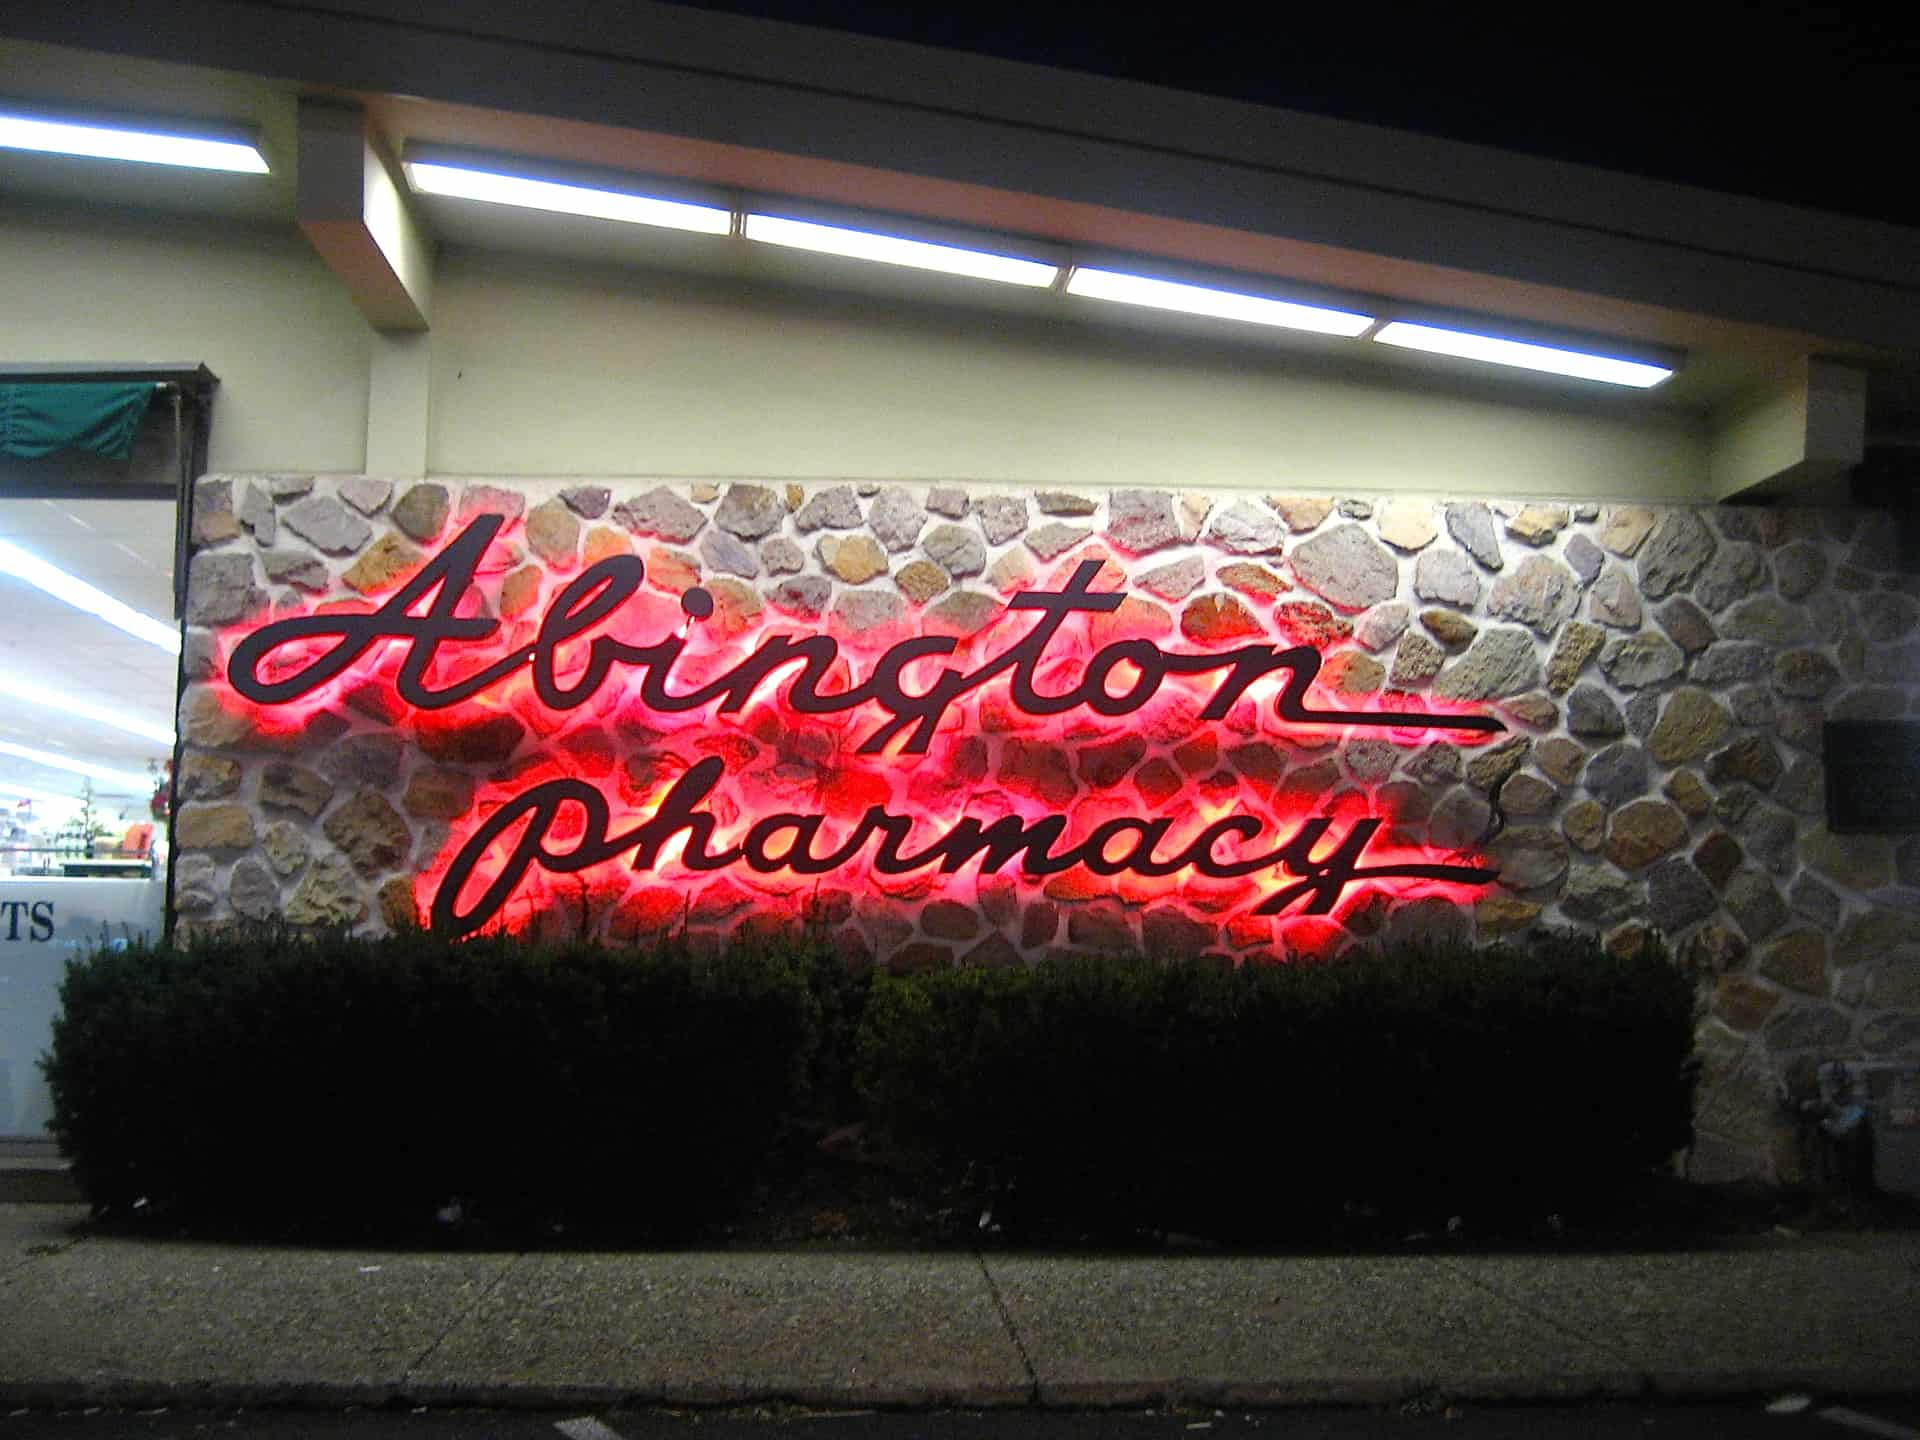 Abington Pharmacy Old York Road - Abington PA - Pennsylvania - Retro Roadmap